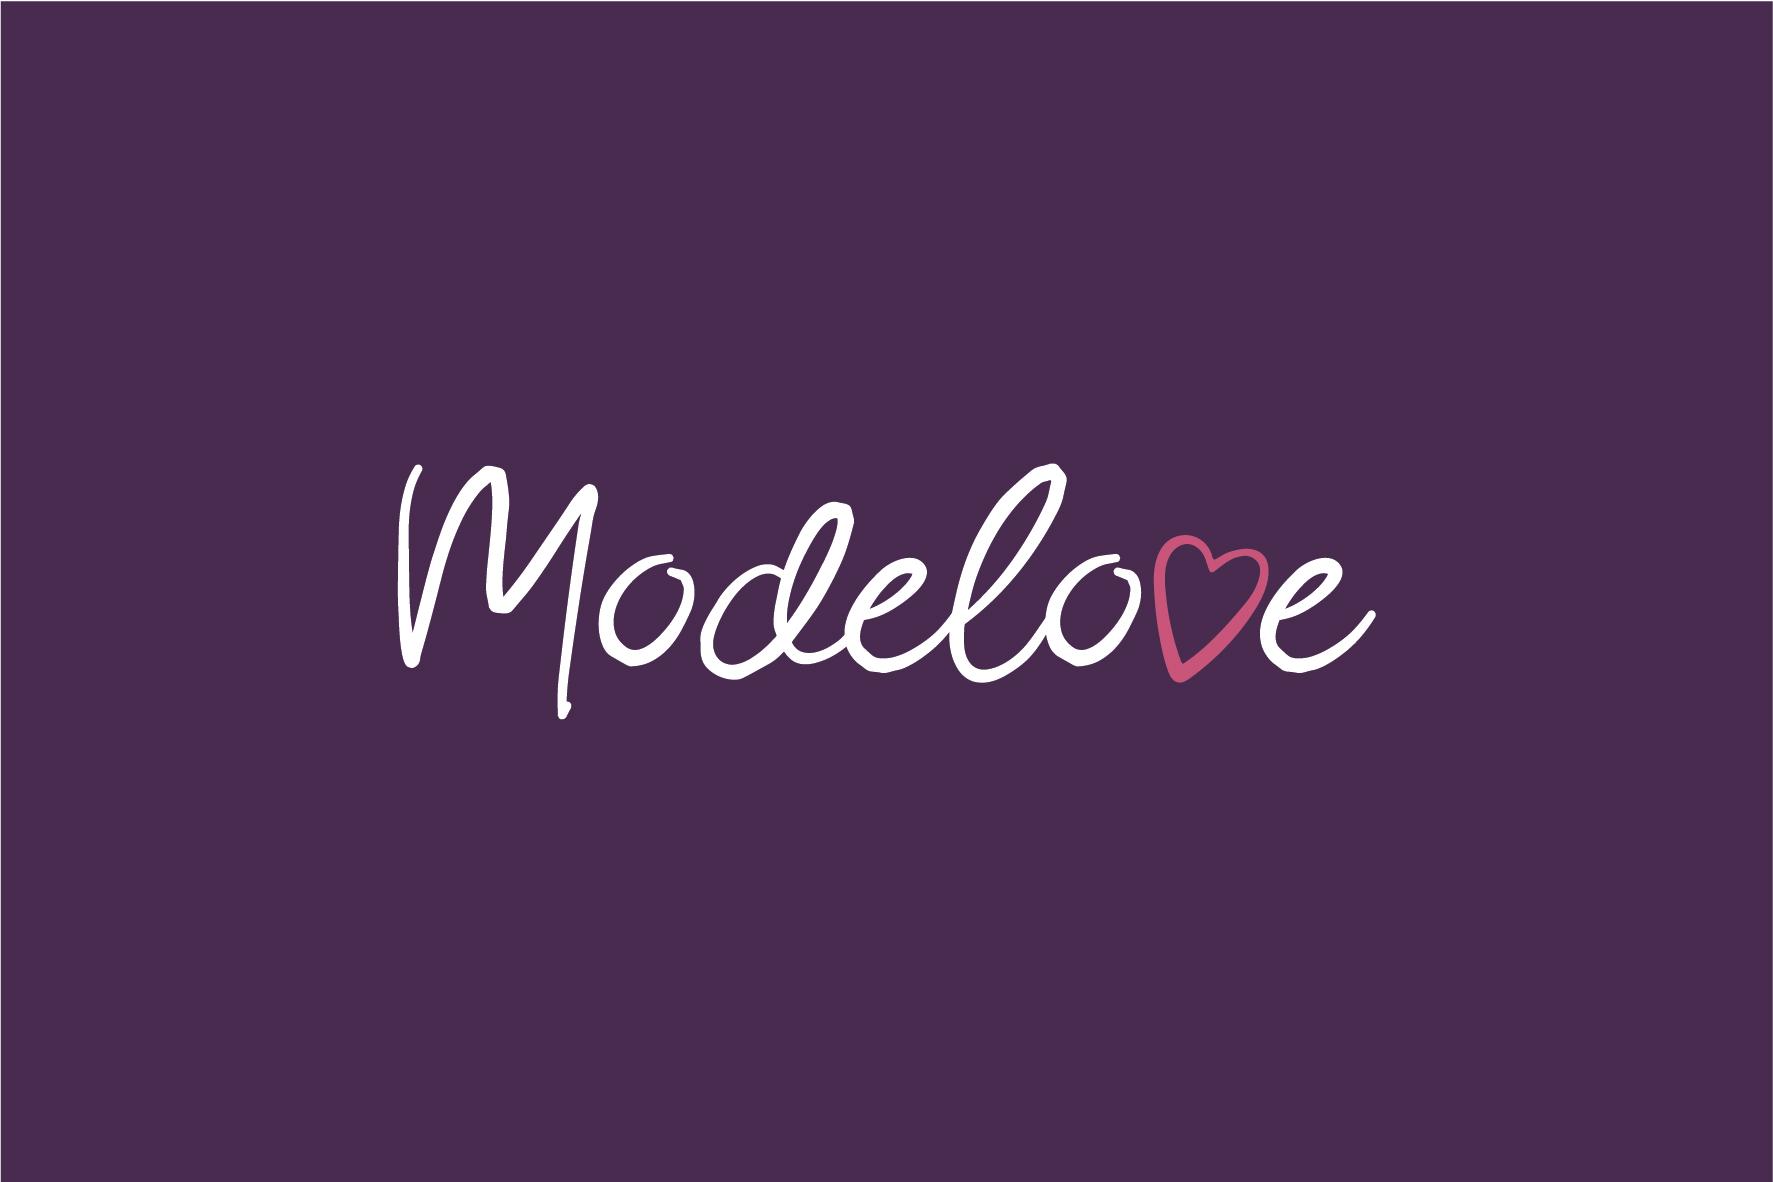 Modelove_logo-08.jpg